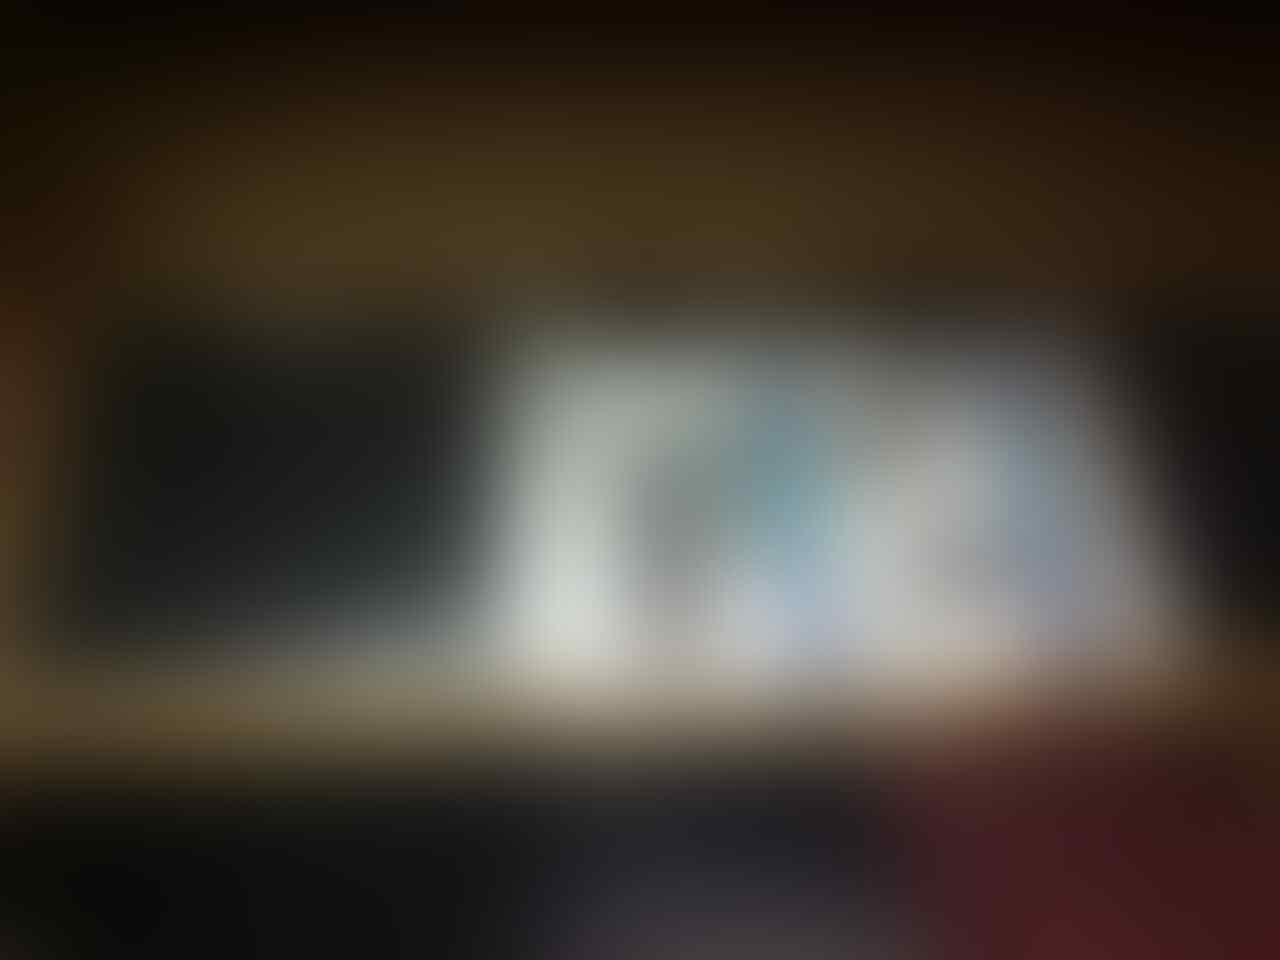 JUAL HP PAV SLIMLINE S5 1320L